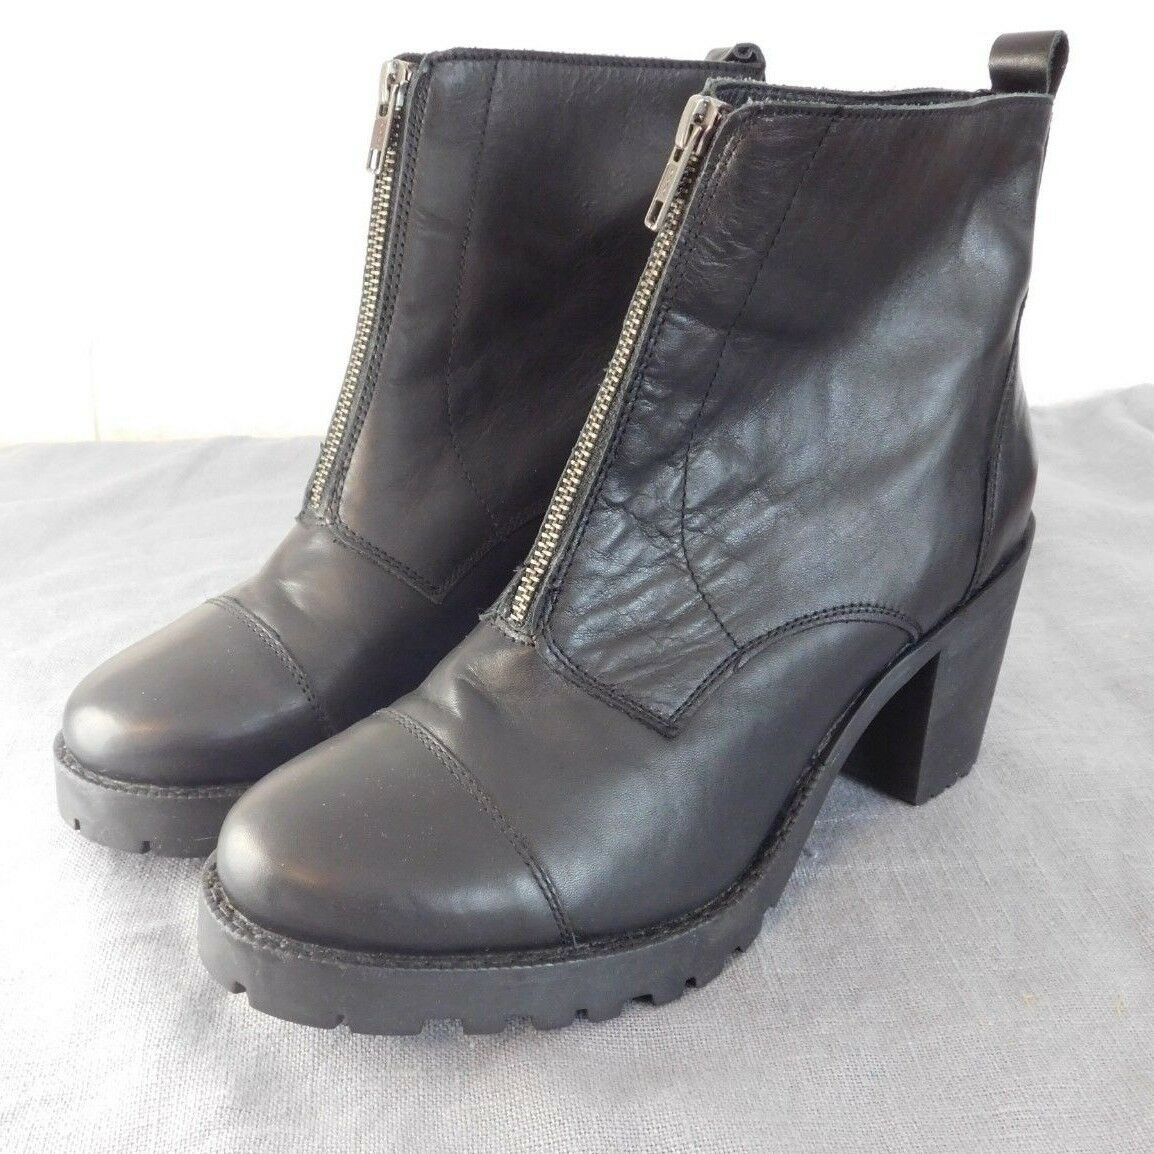 ZIGN Stiefel   Gr. 42   Echtleder mit Reißverschluss am Spann